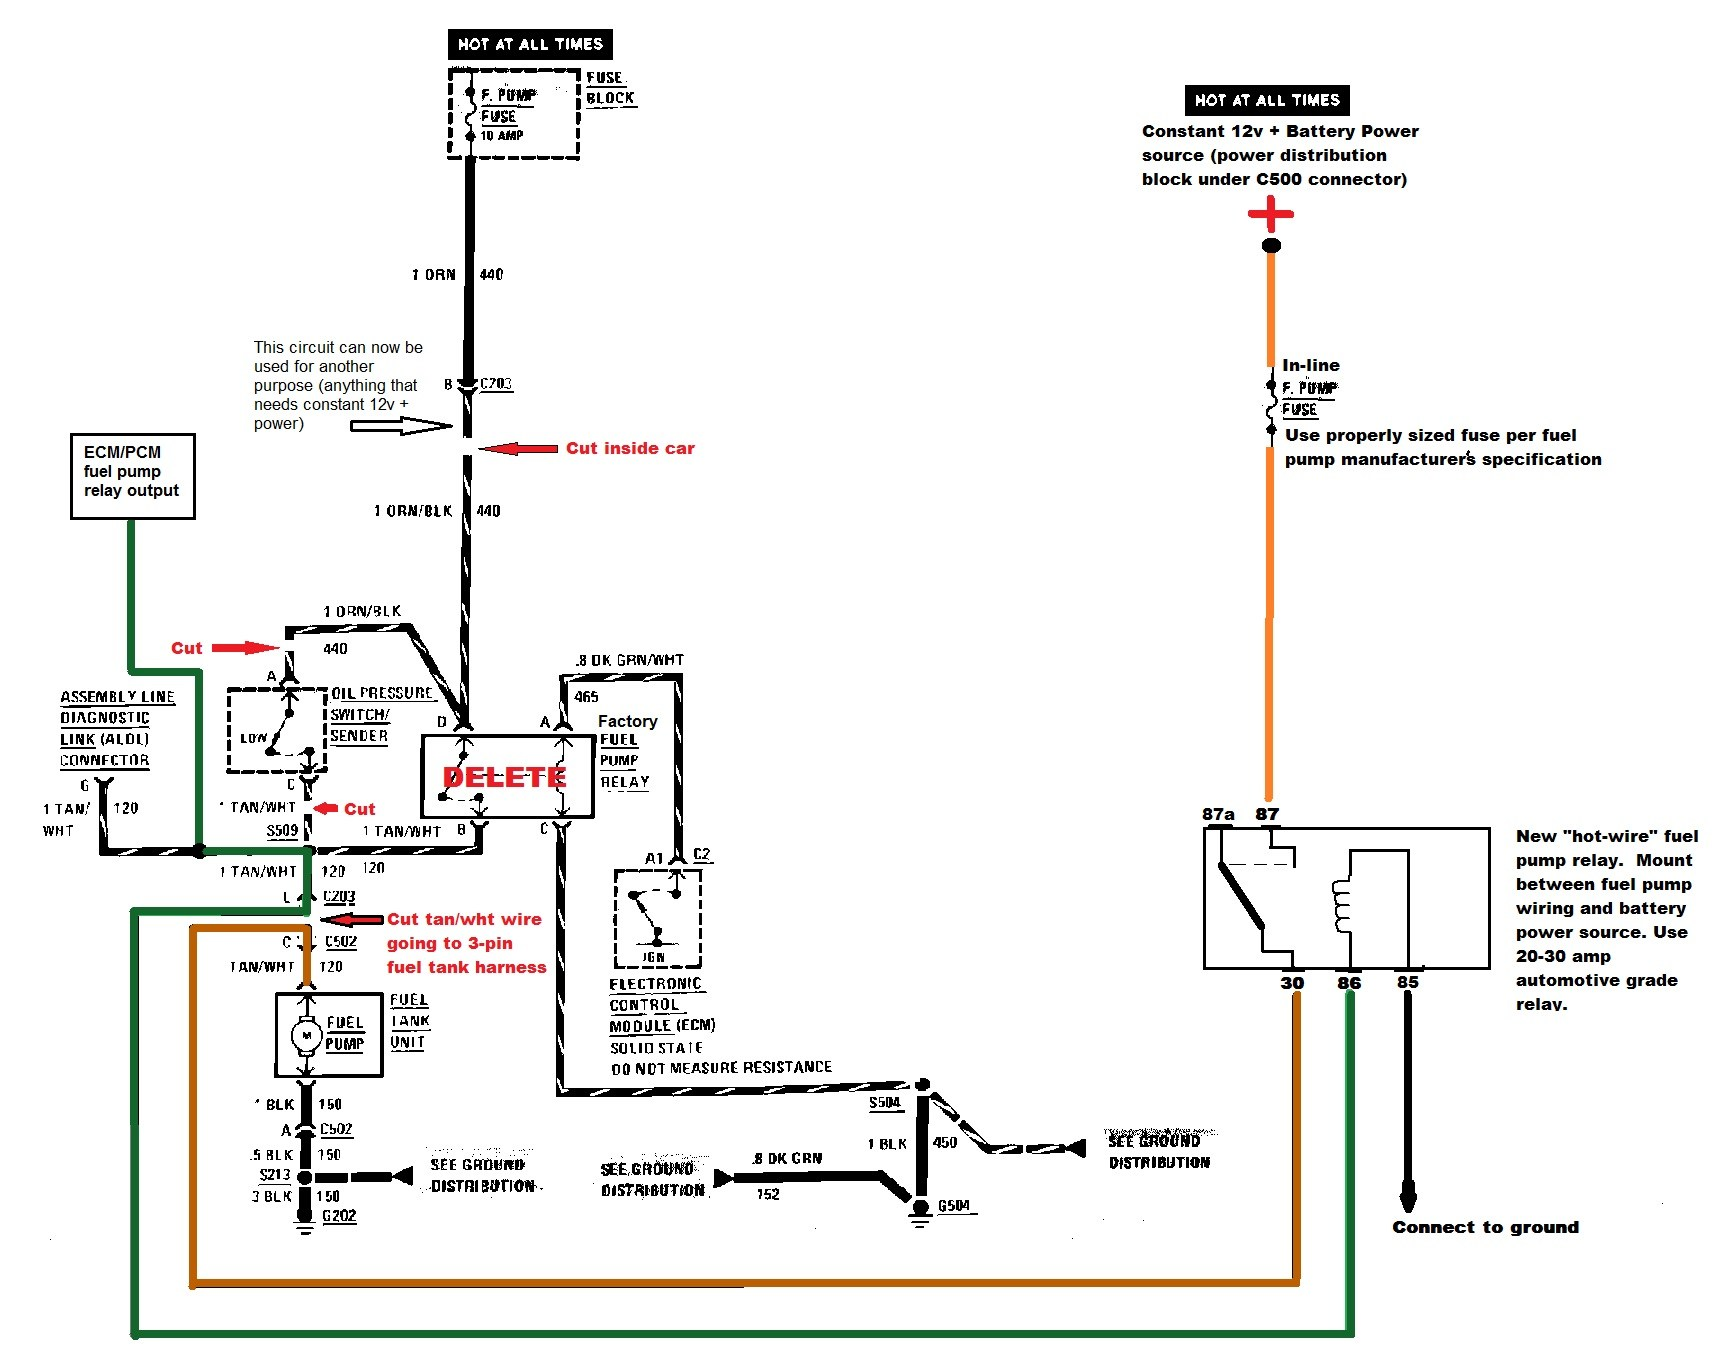 [DIAGRAM_5FD]  Fiero Headlight Wiring Diagram - Imperial Range Wiring Diagram for Wiring  Diagram Schematics | Fiero Tail Wiring Diagram |  | Wiring Diagram Schematics